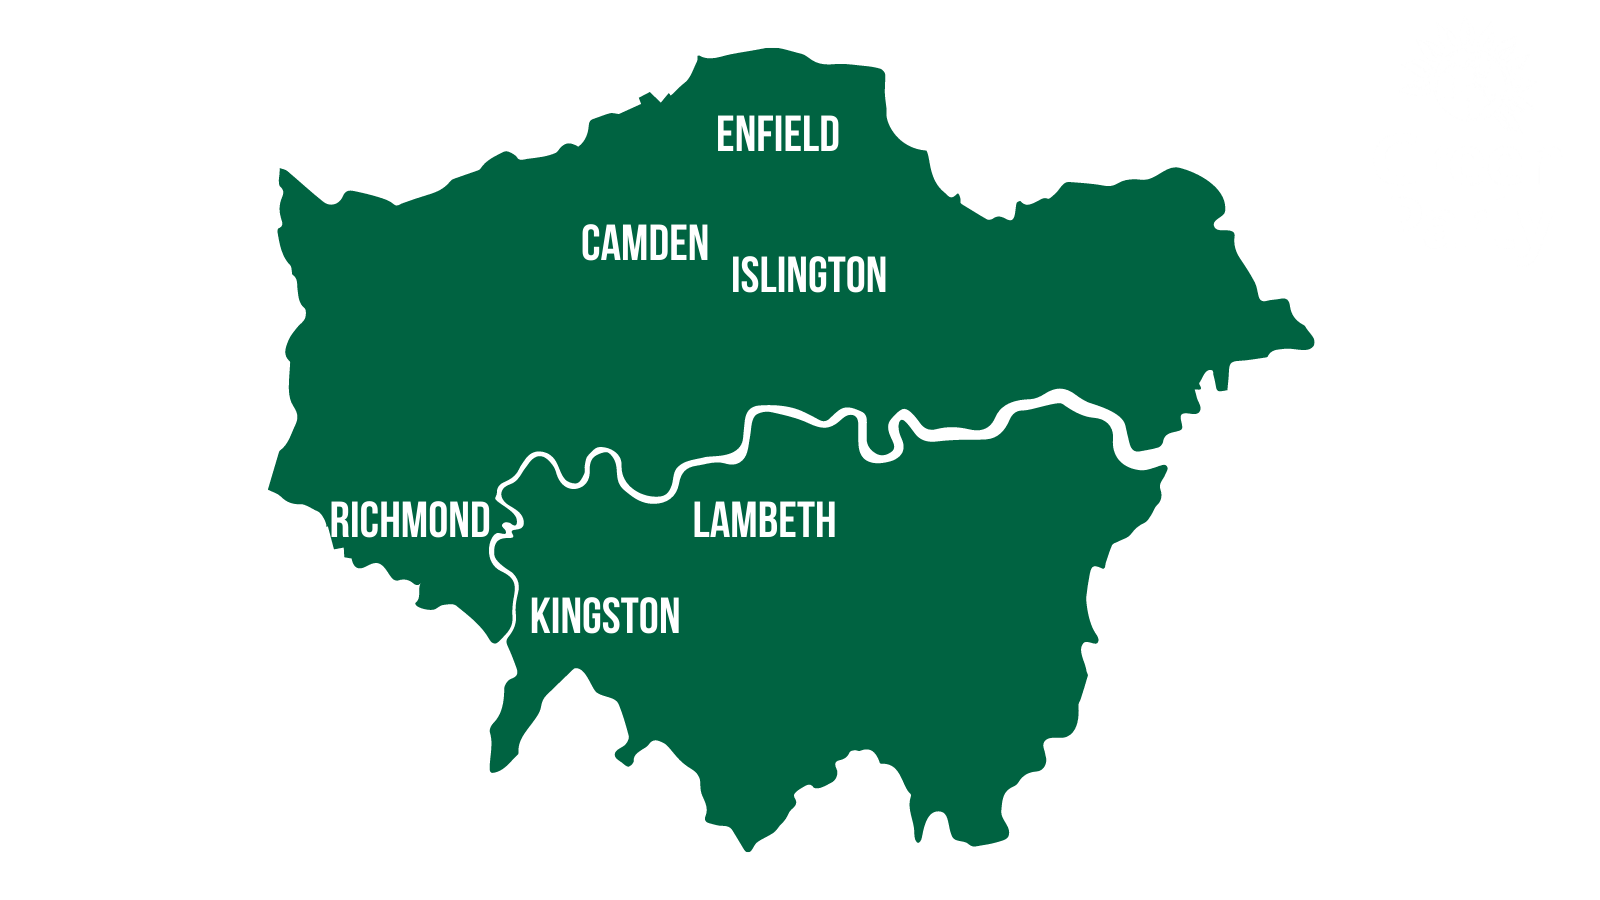 London Map showing Enfield, Camden, Islington, Lambeth, Richmond and Kingston